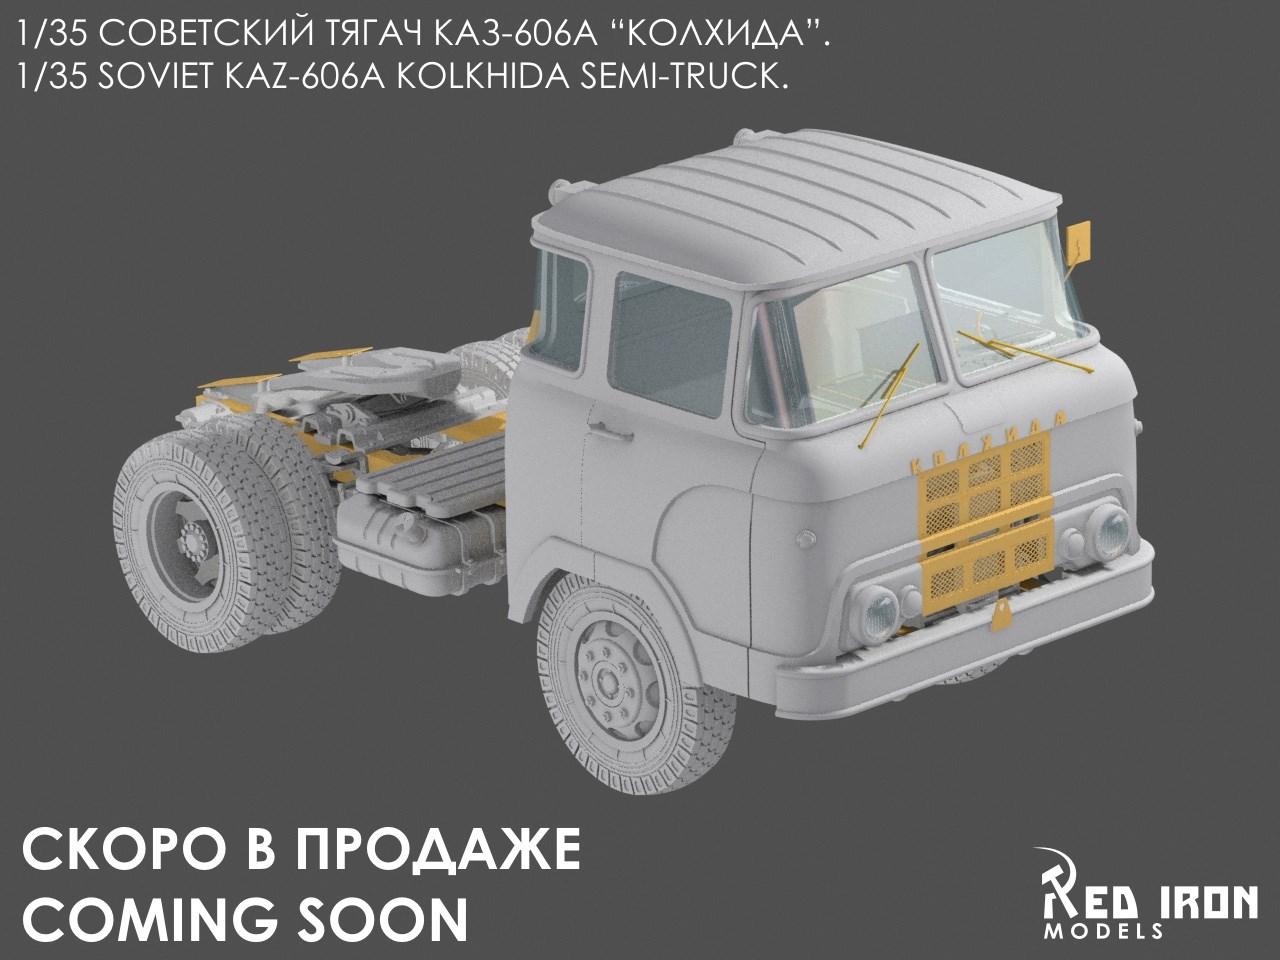 Armorama : Red Iron: KAZ-606 semi-truck